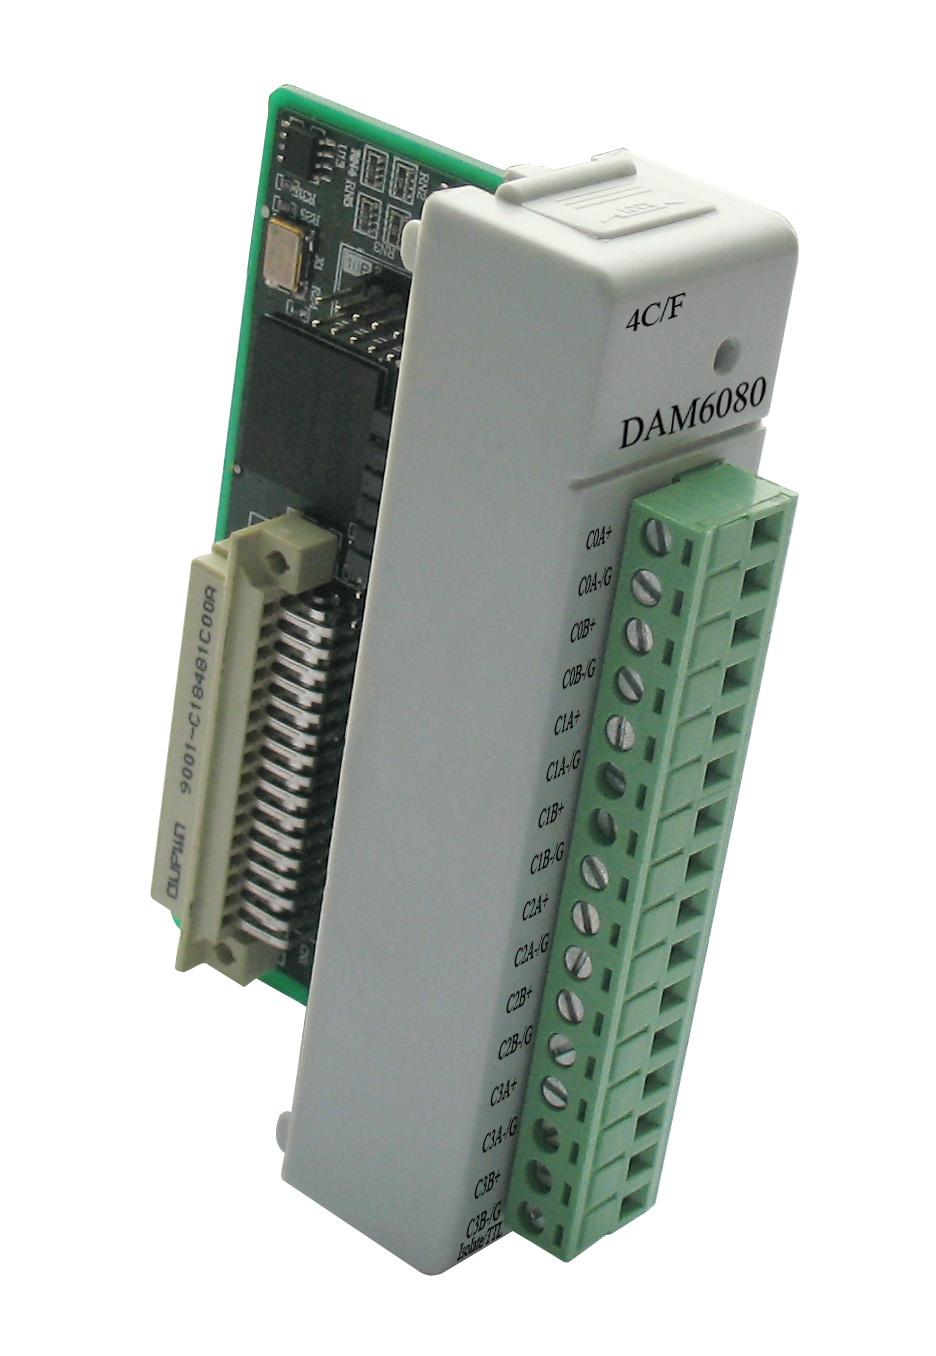 ART-阿尔泰DAM6080-4通道 32位计数器/频率模块